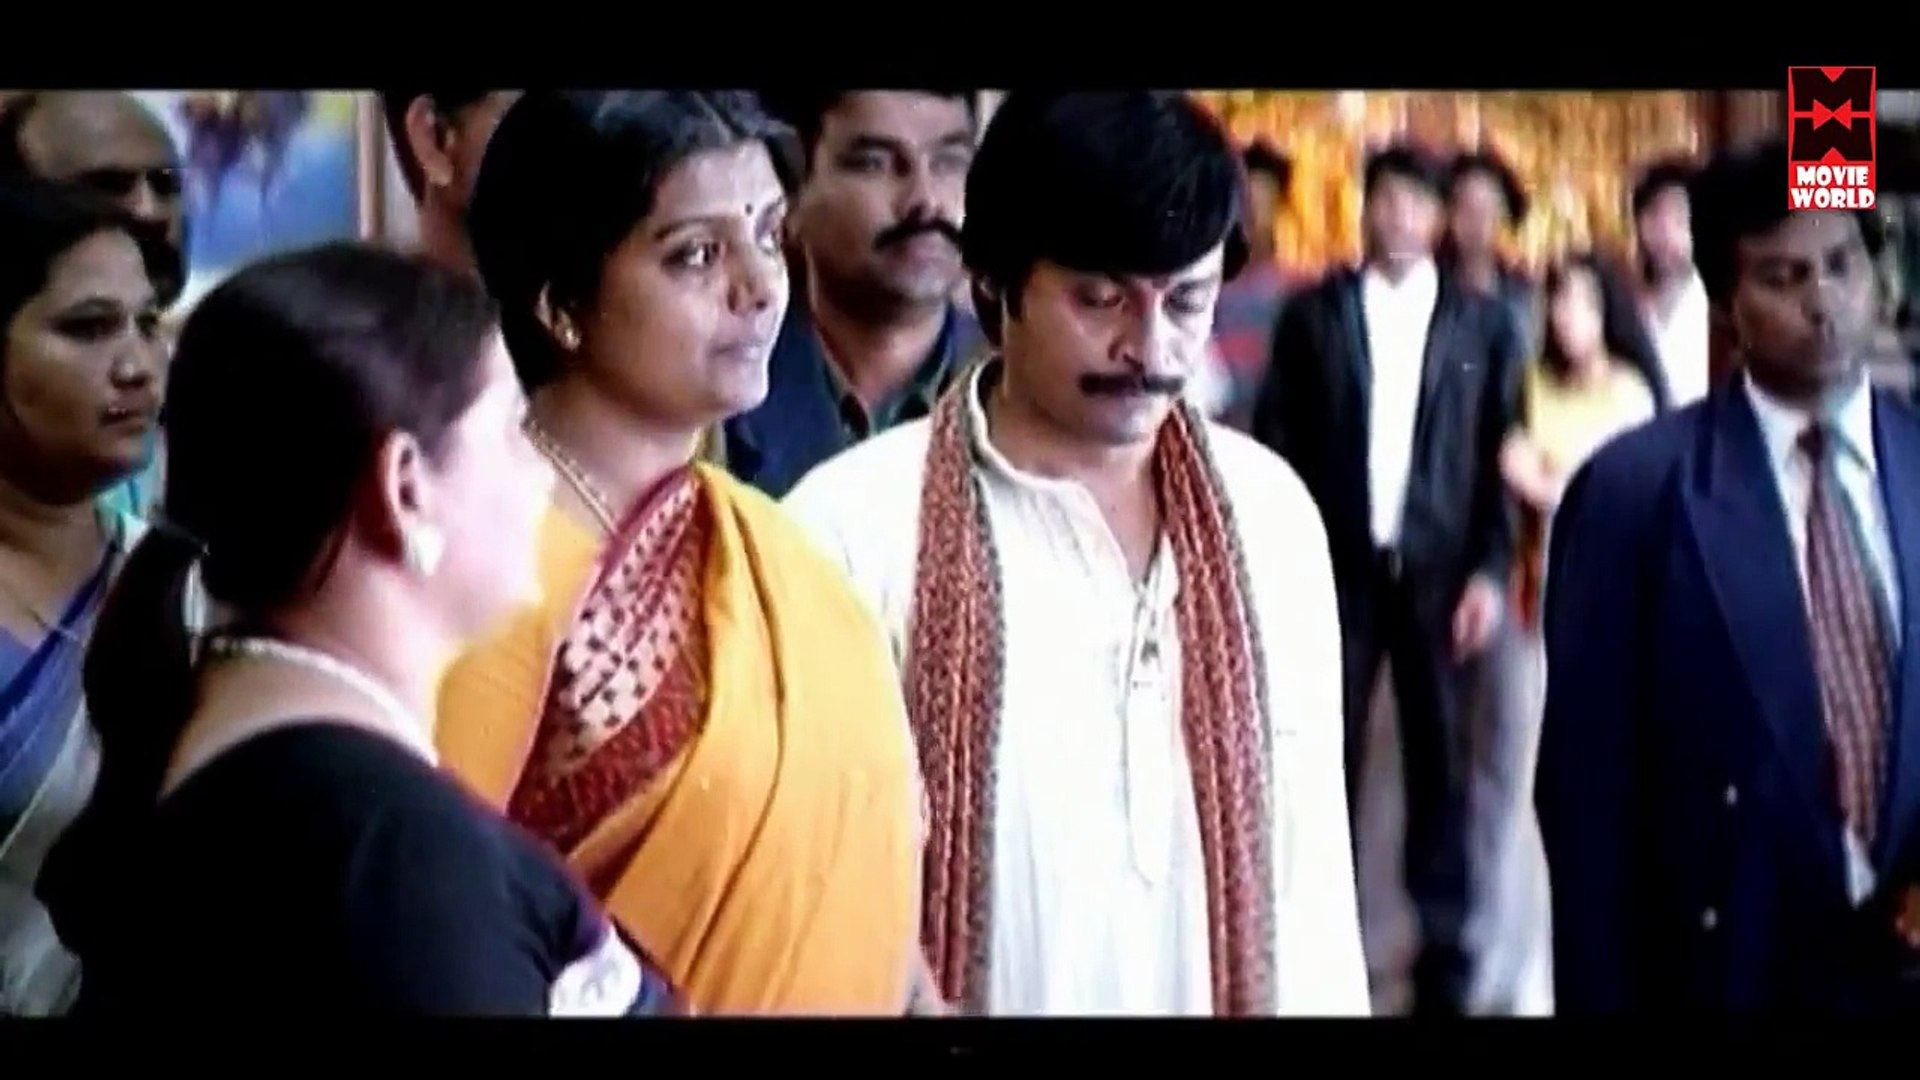 Oriya Movie Full || Chatrapati || Prabhas, Shriya Saran || Odia Movie Full Mini Movie